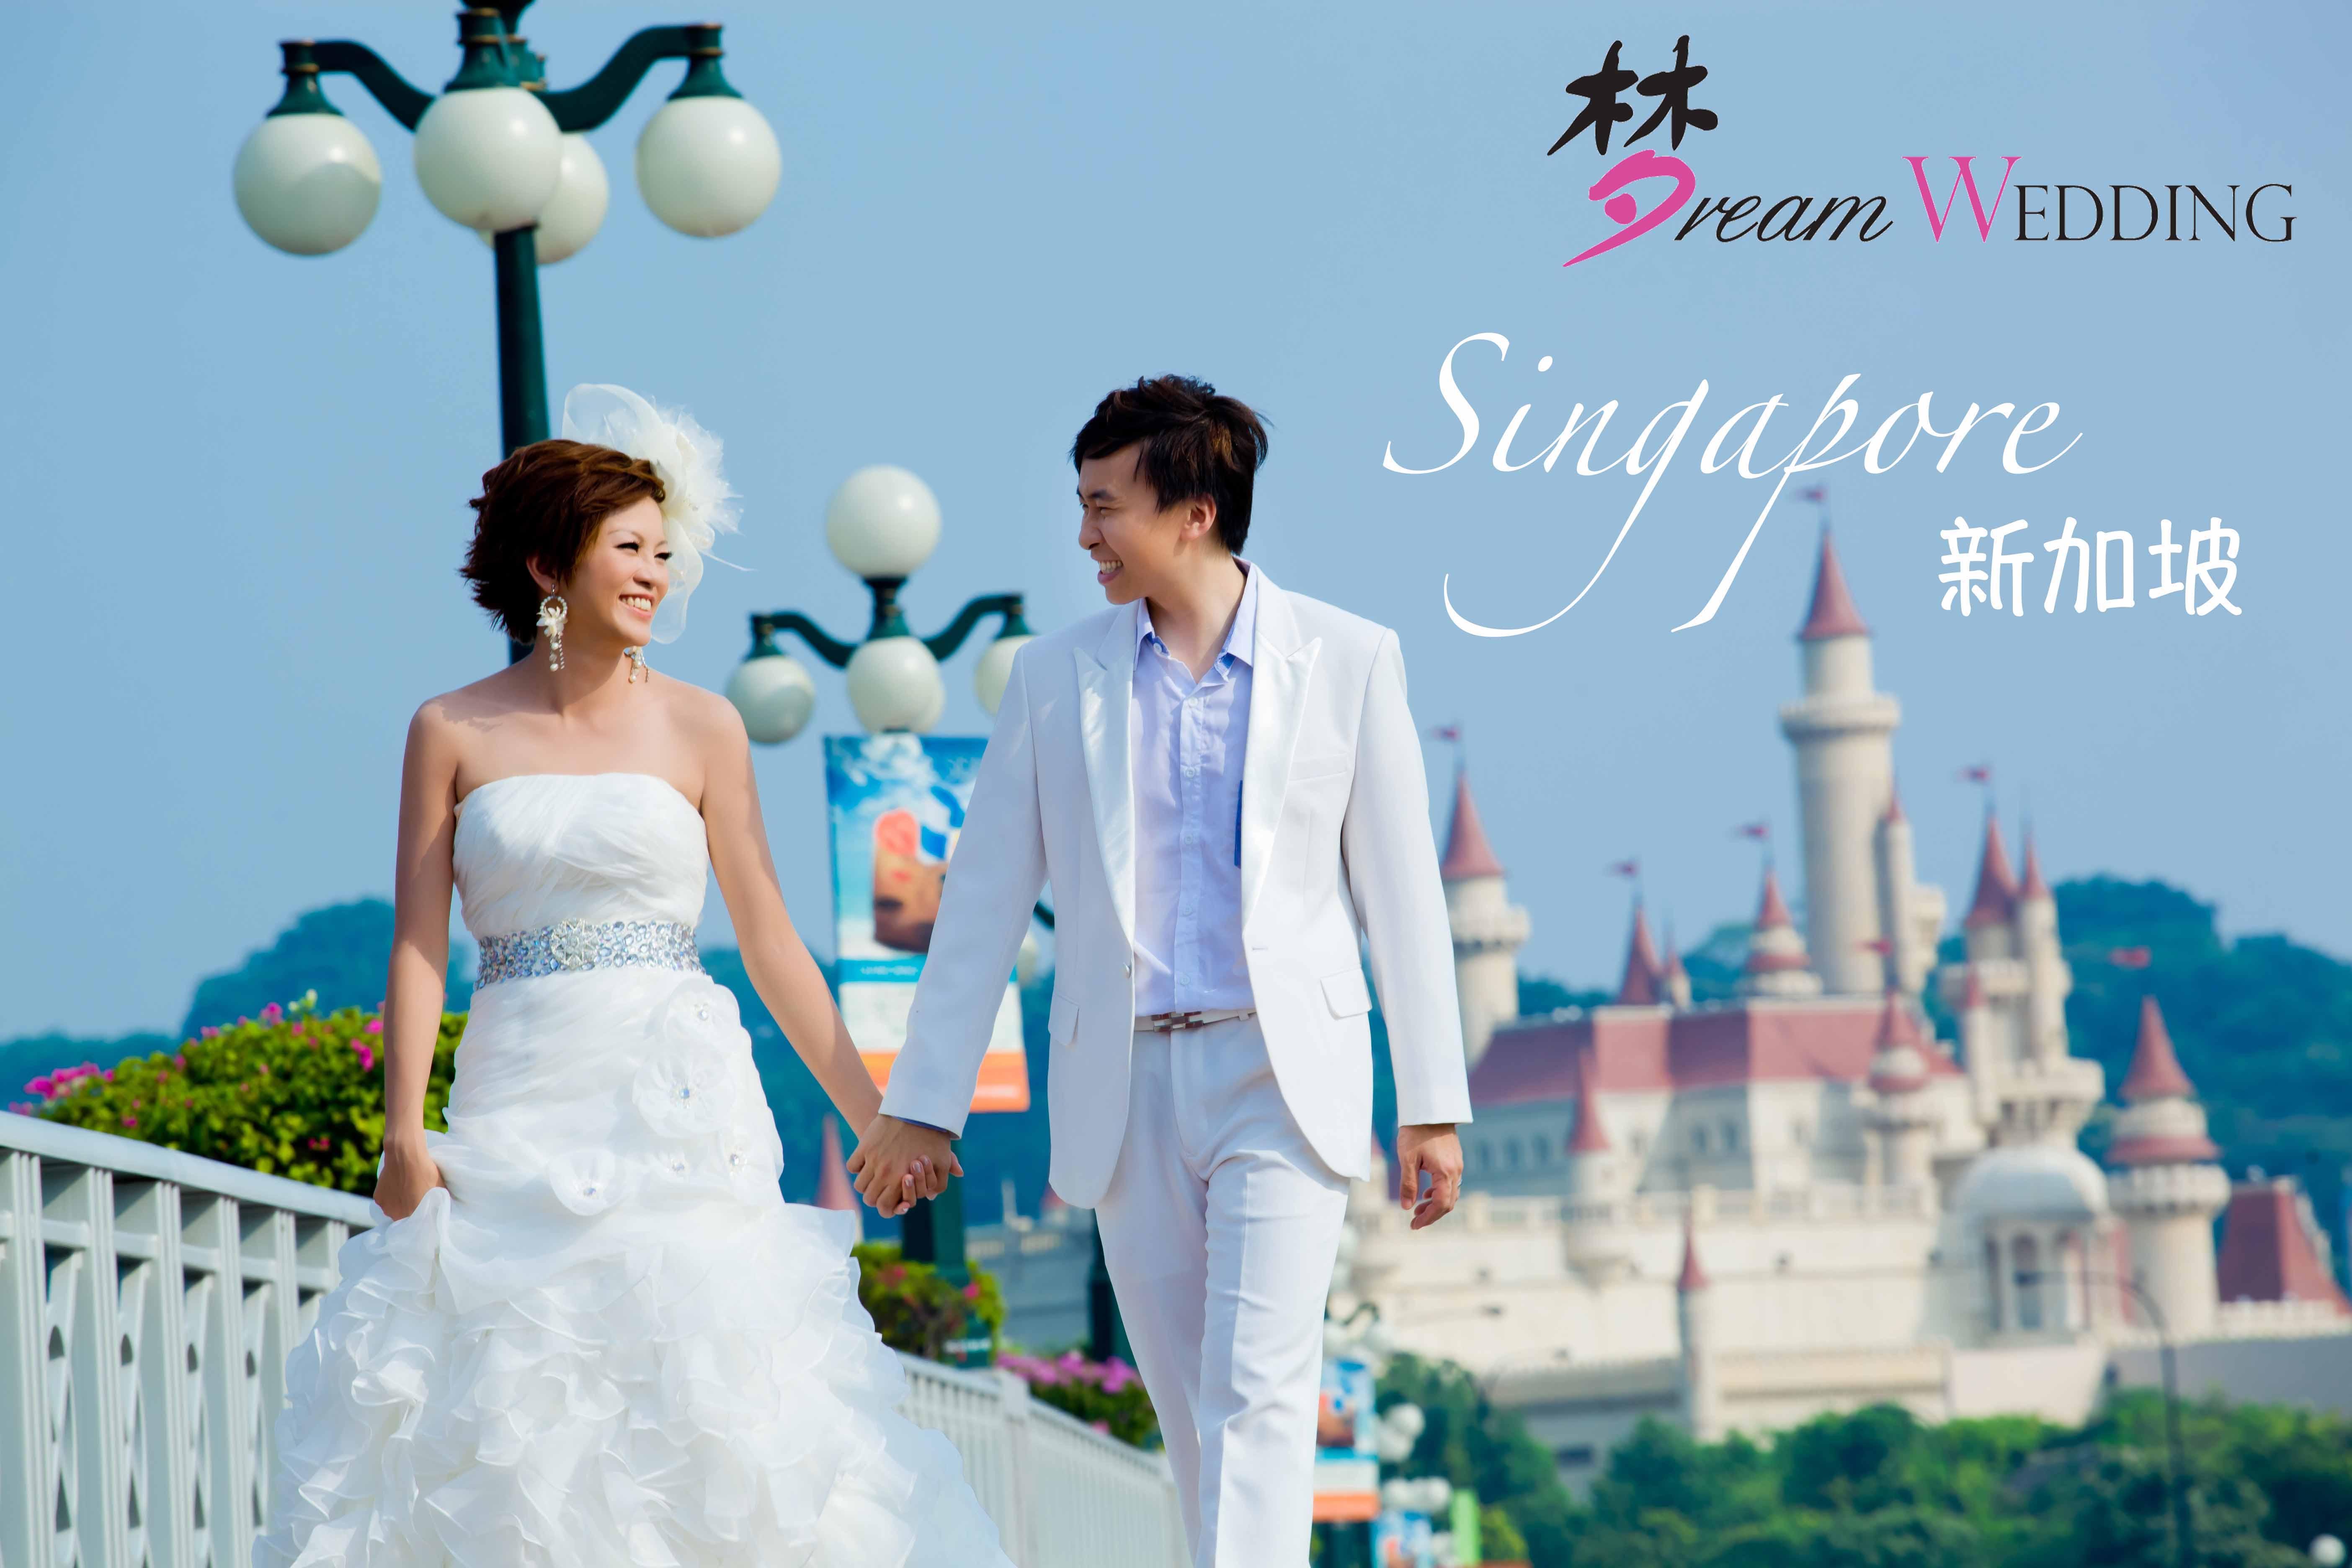 Singapore pre wedding photography package bridal dream wedding boutique signature photoshoot sentosa castle